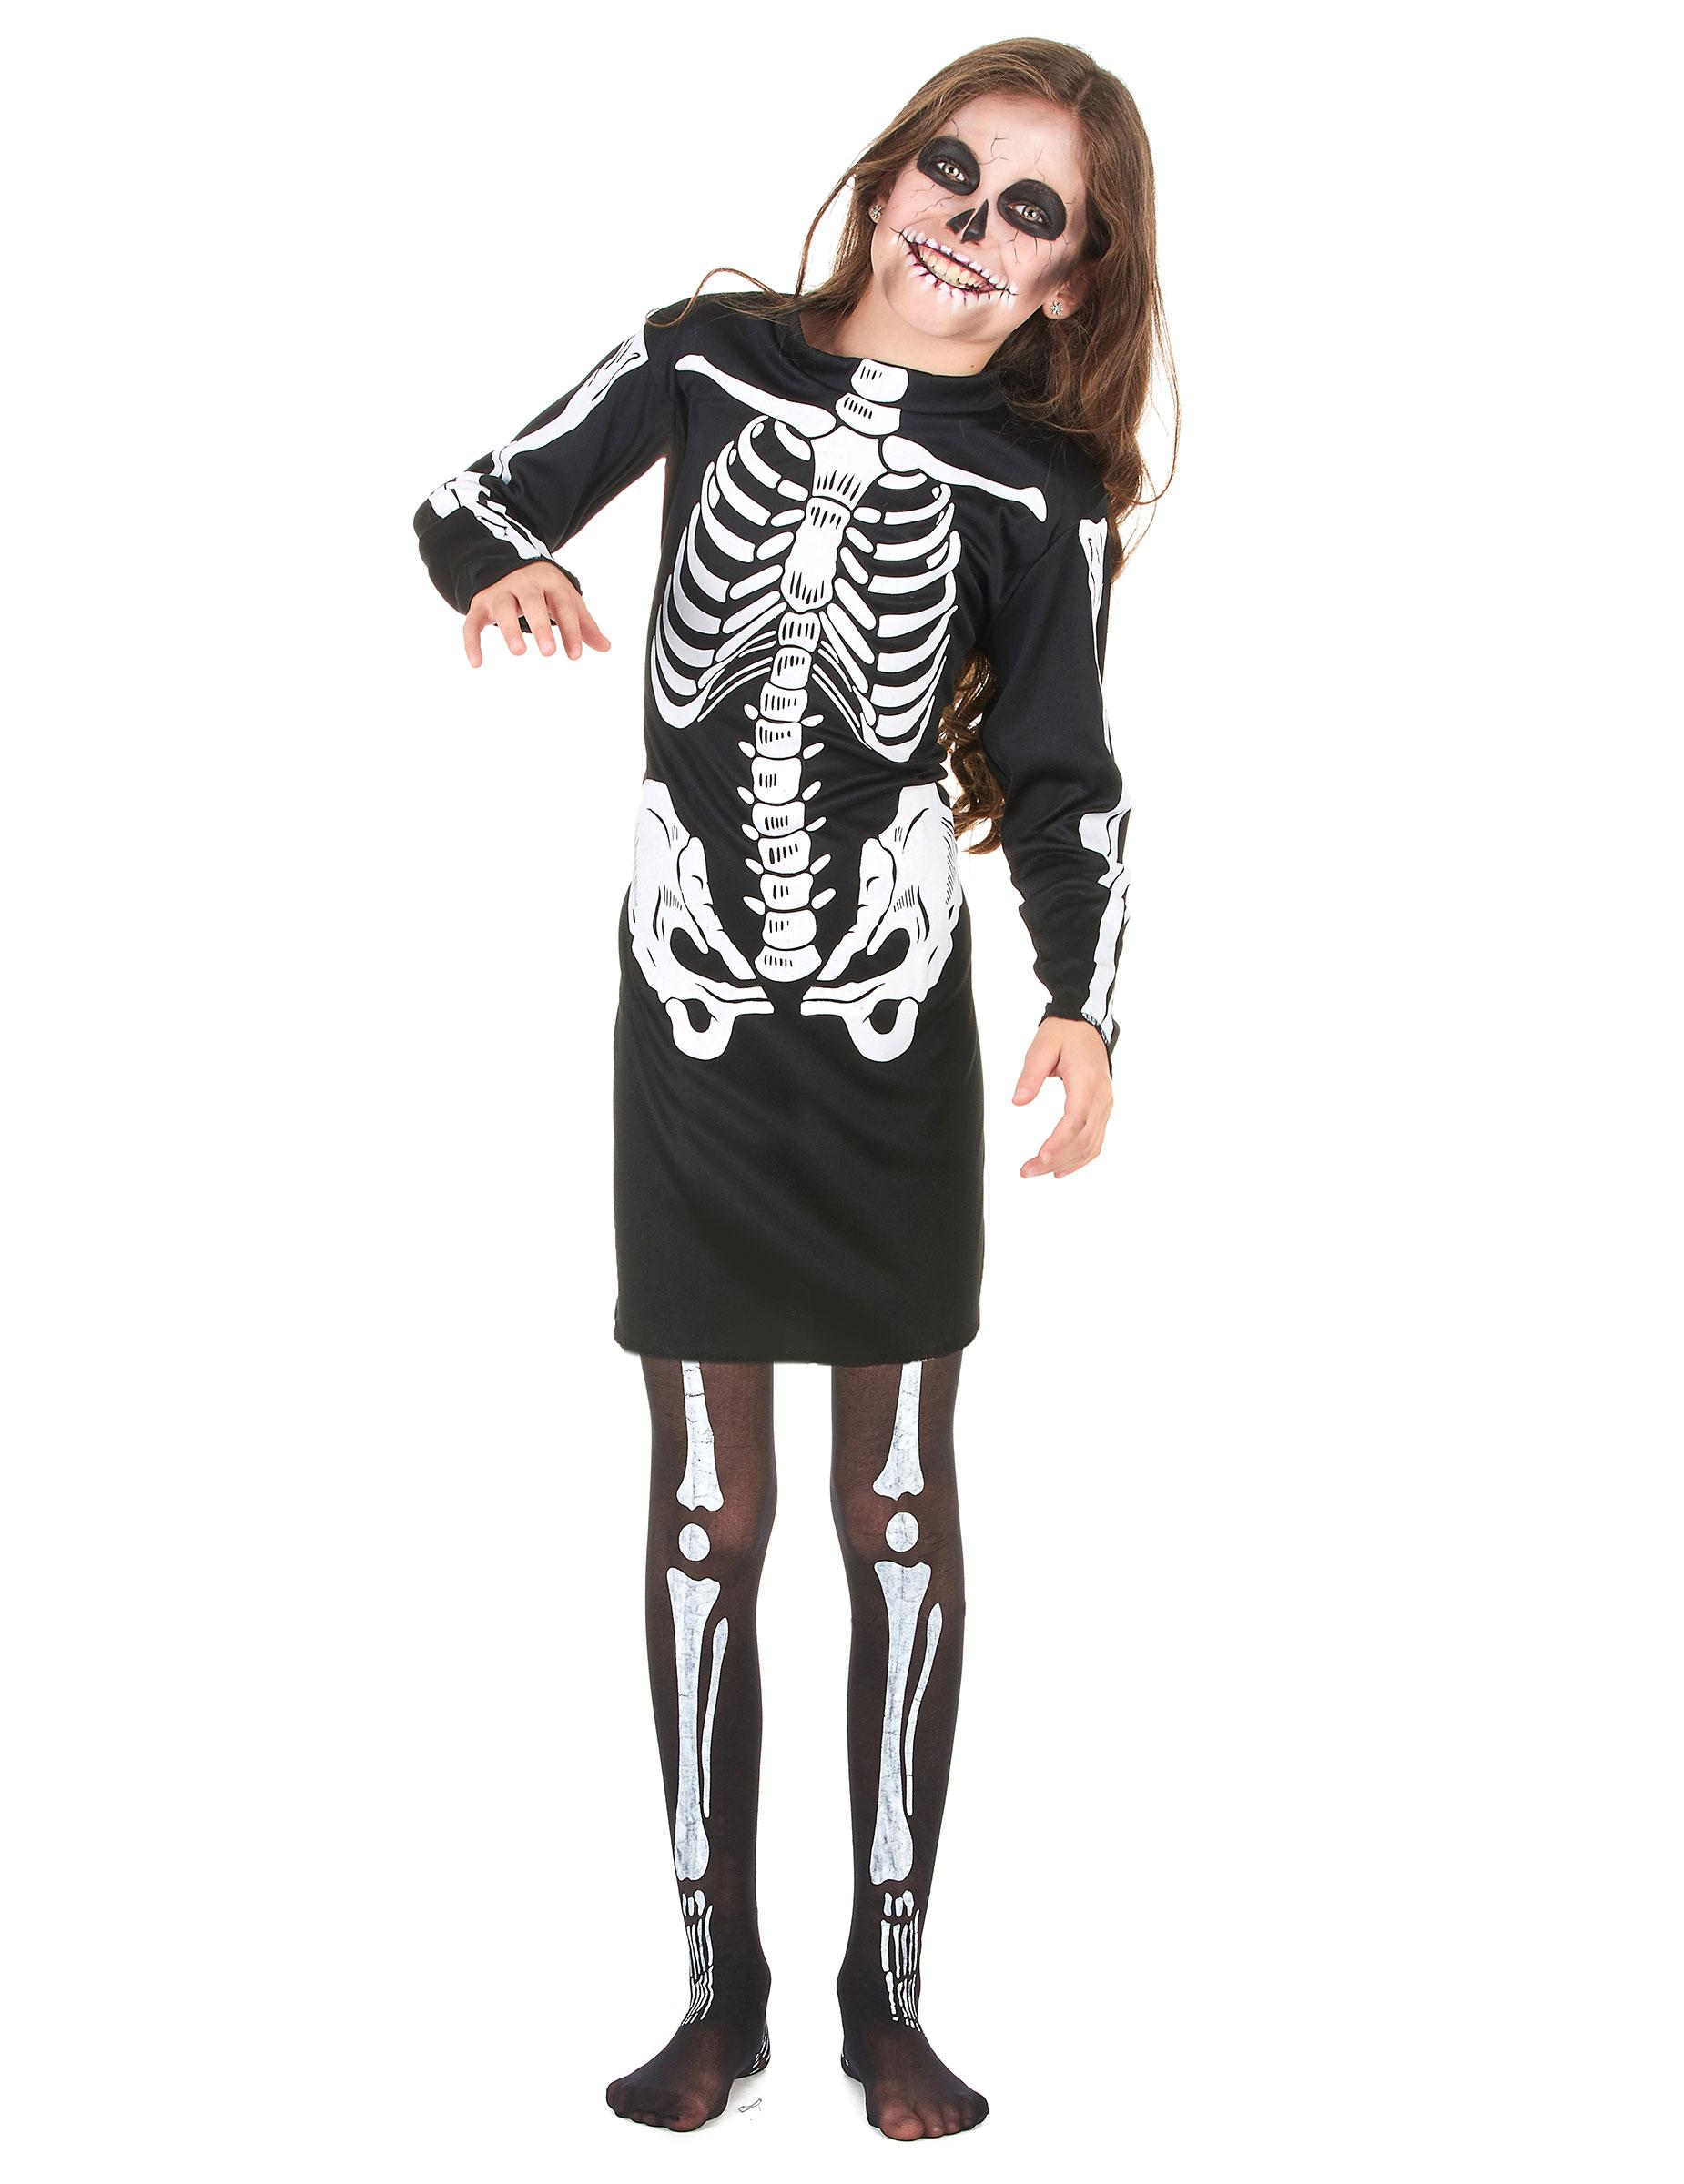 Costume da scheletro per bambina - Halloween 5b23ac87c49